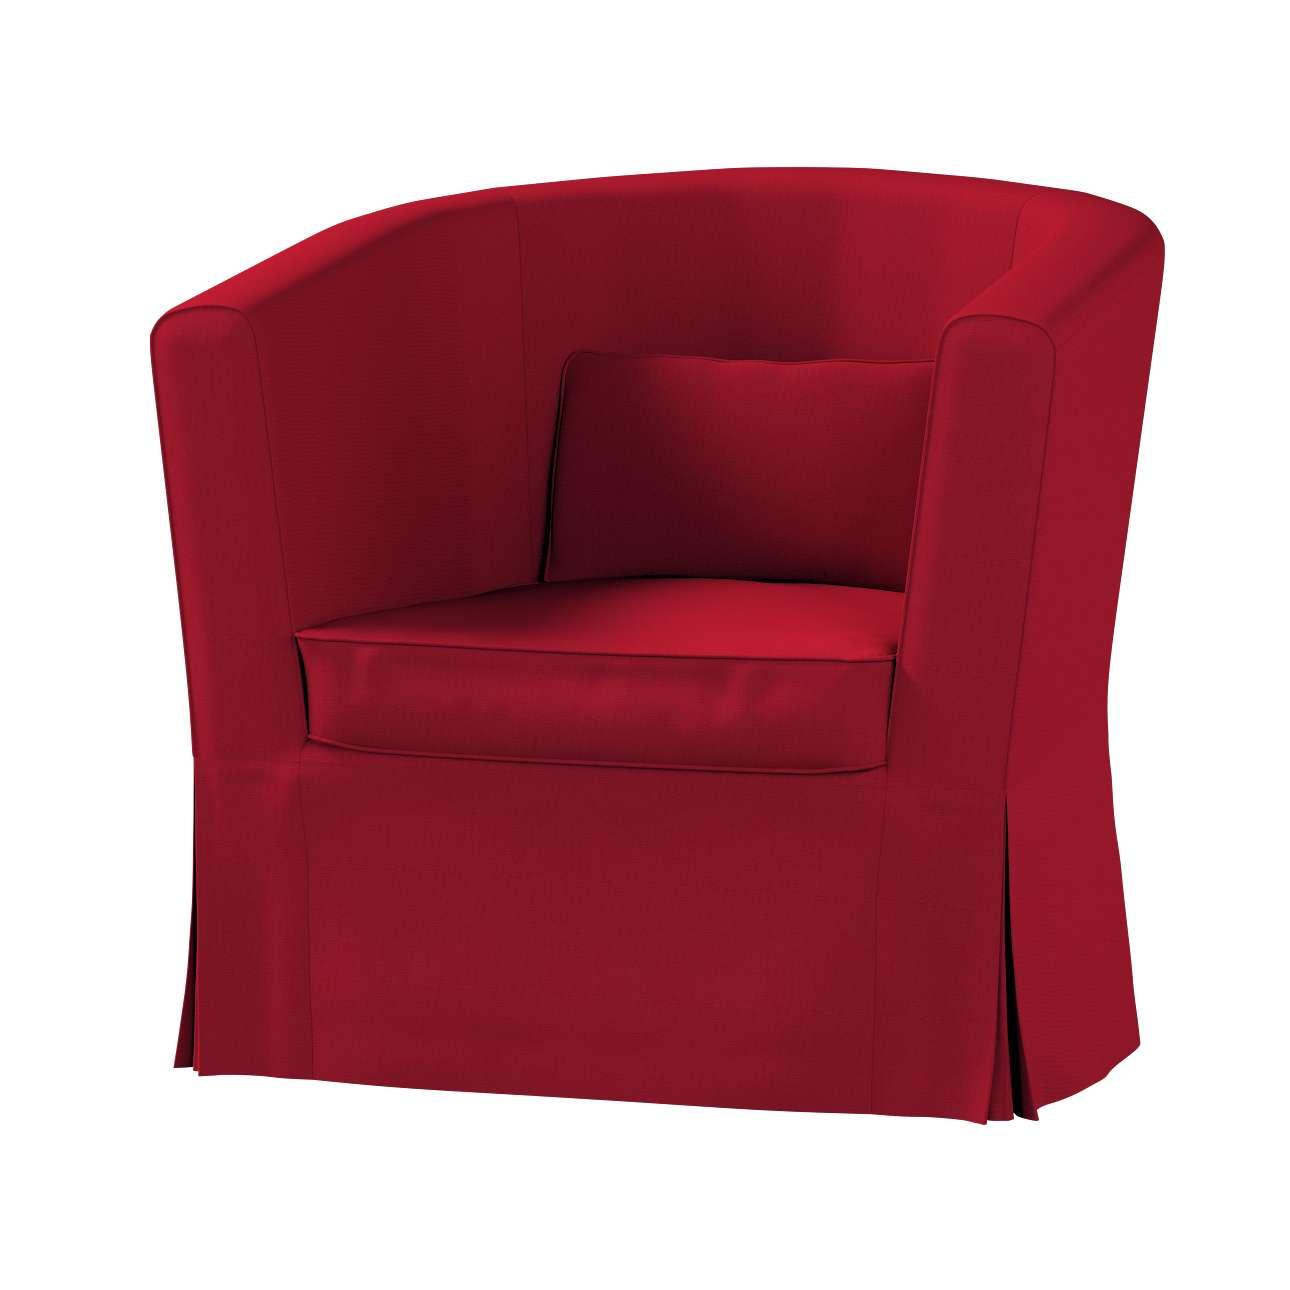 Pokrowiec na fotel Ektorp Tullsta fotel Ektorp Tullsta w kolekcji Etna , tkanina: 705-60